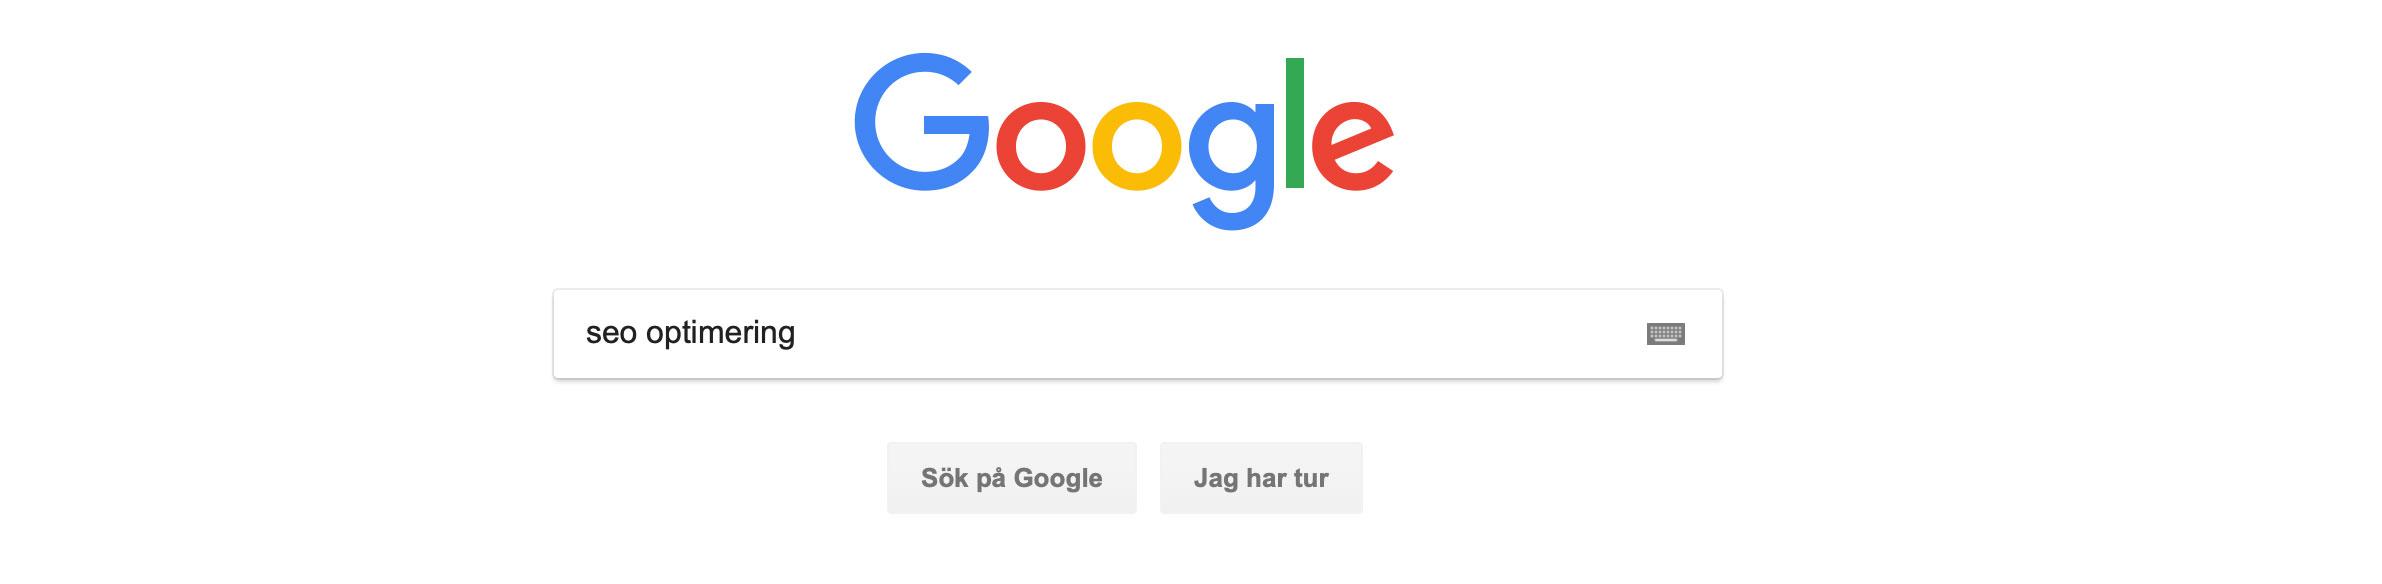 seo-optimering-google